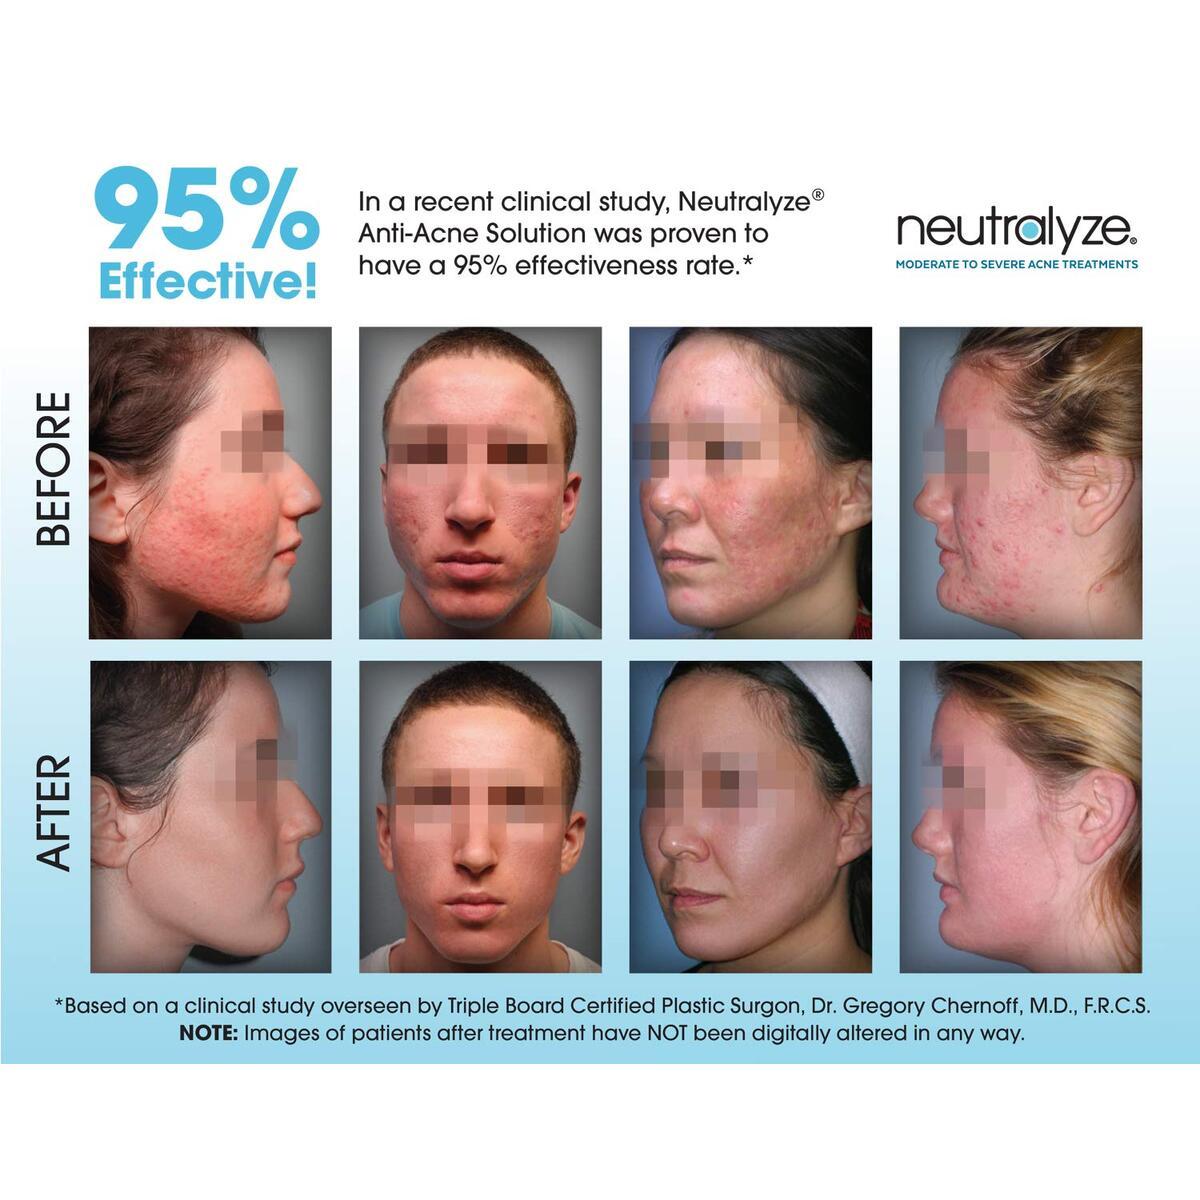 Neutralyze Moderate To Severe Acne Clearing Serum | Maximum Strength Cystic Acne Serum + Acne Spot Treatment Gel With 2% Salicylic Acid + 1% Mandelic Acid + Nitrogen Boost Skincare Technology (1.5 oz)